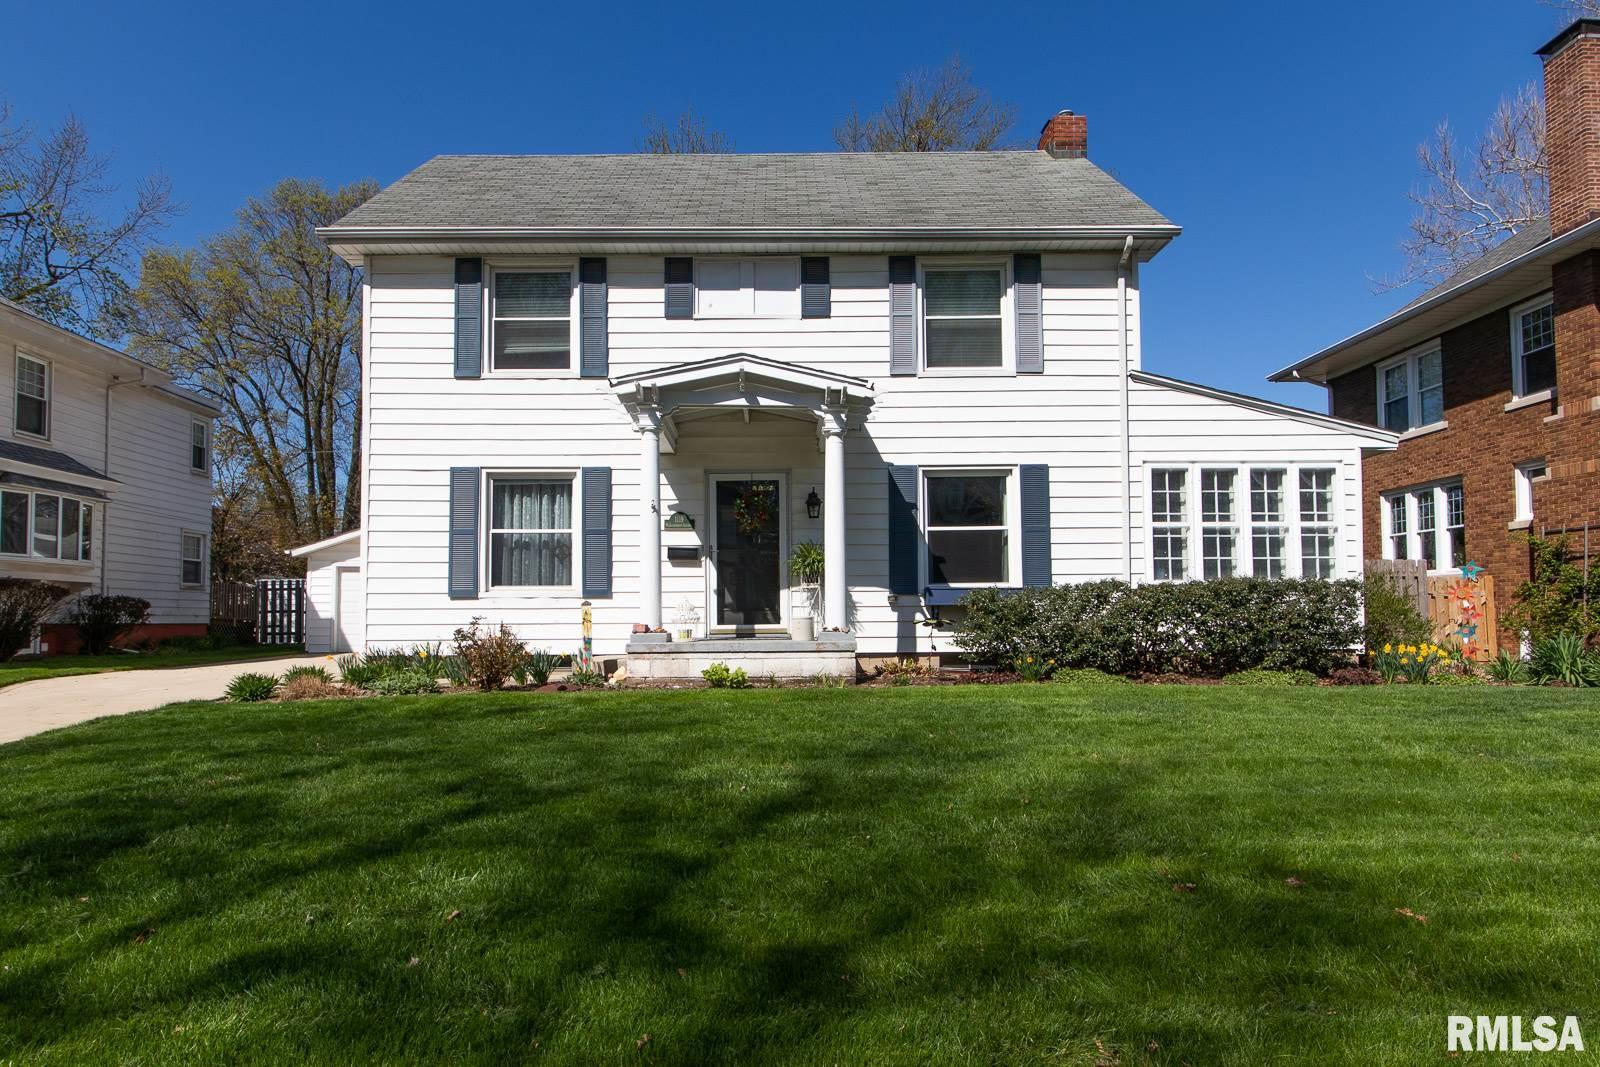 1119 N GLENWOOD Property Photo - Peoria, IL real estate listing